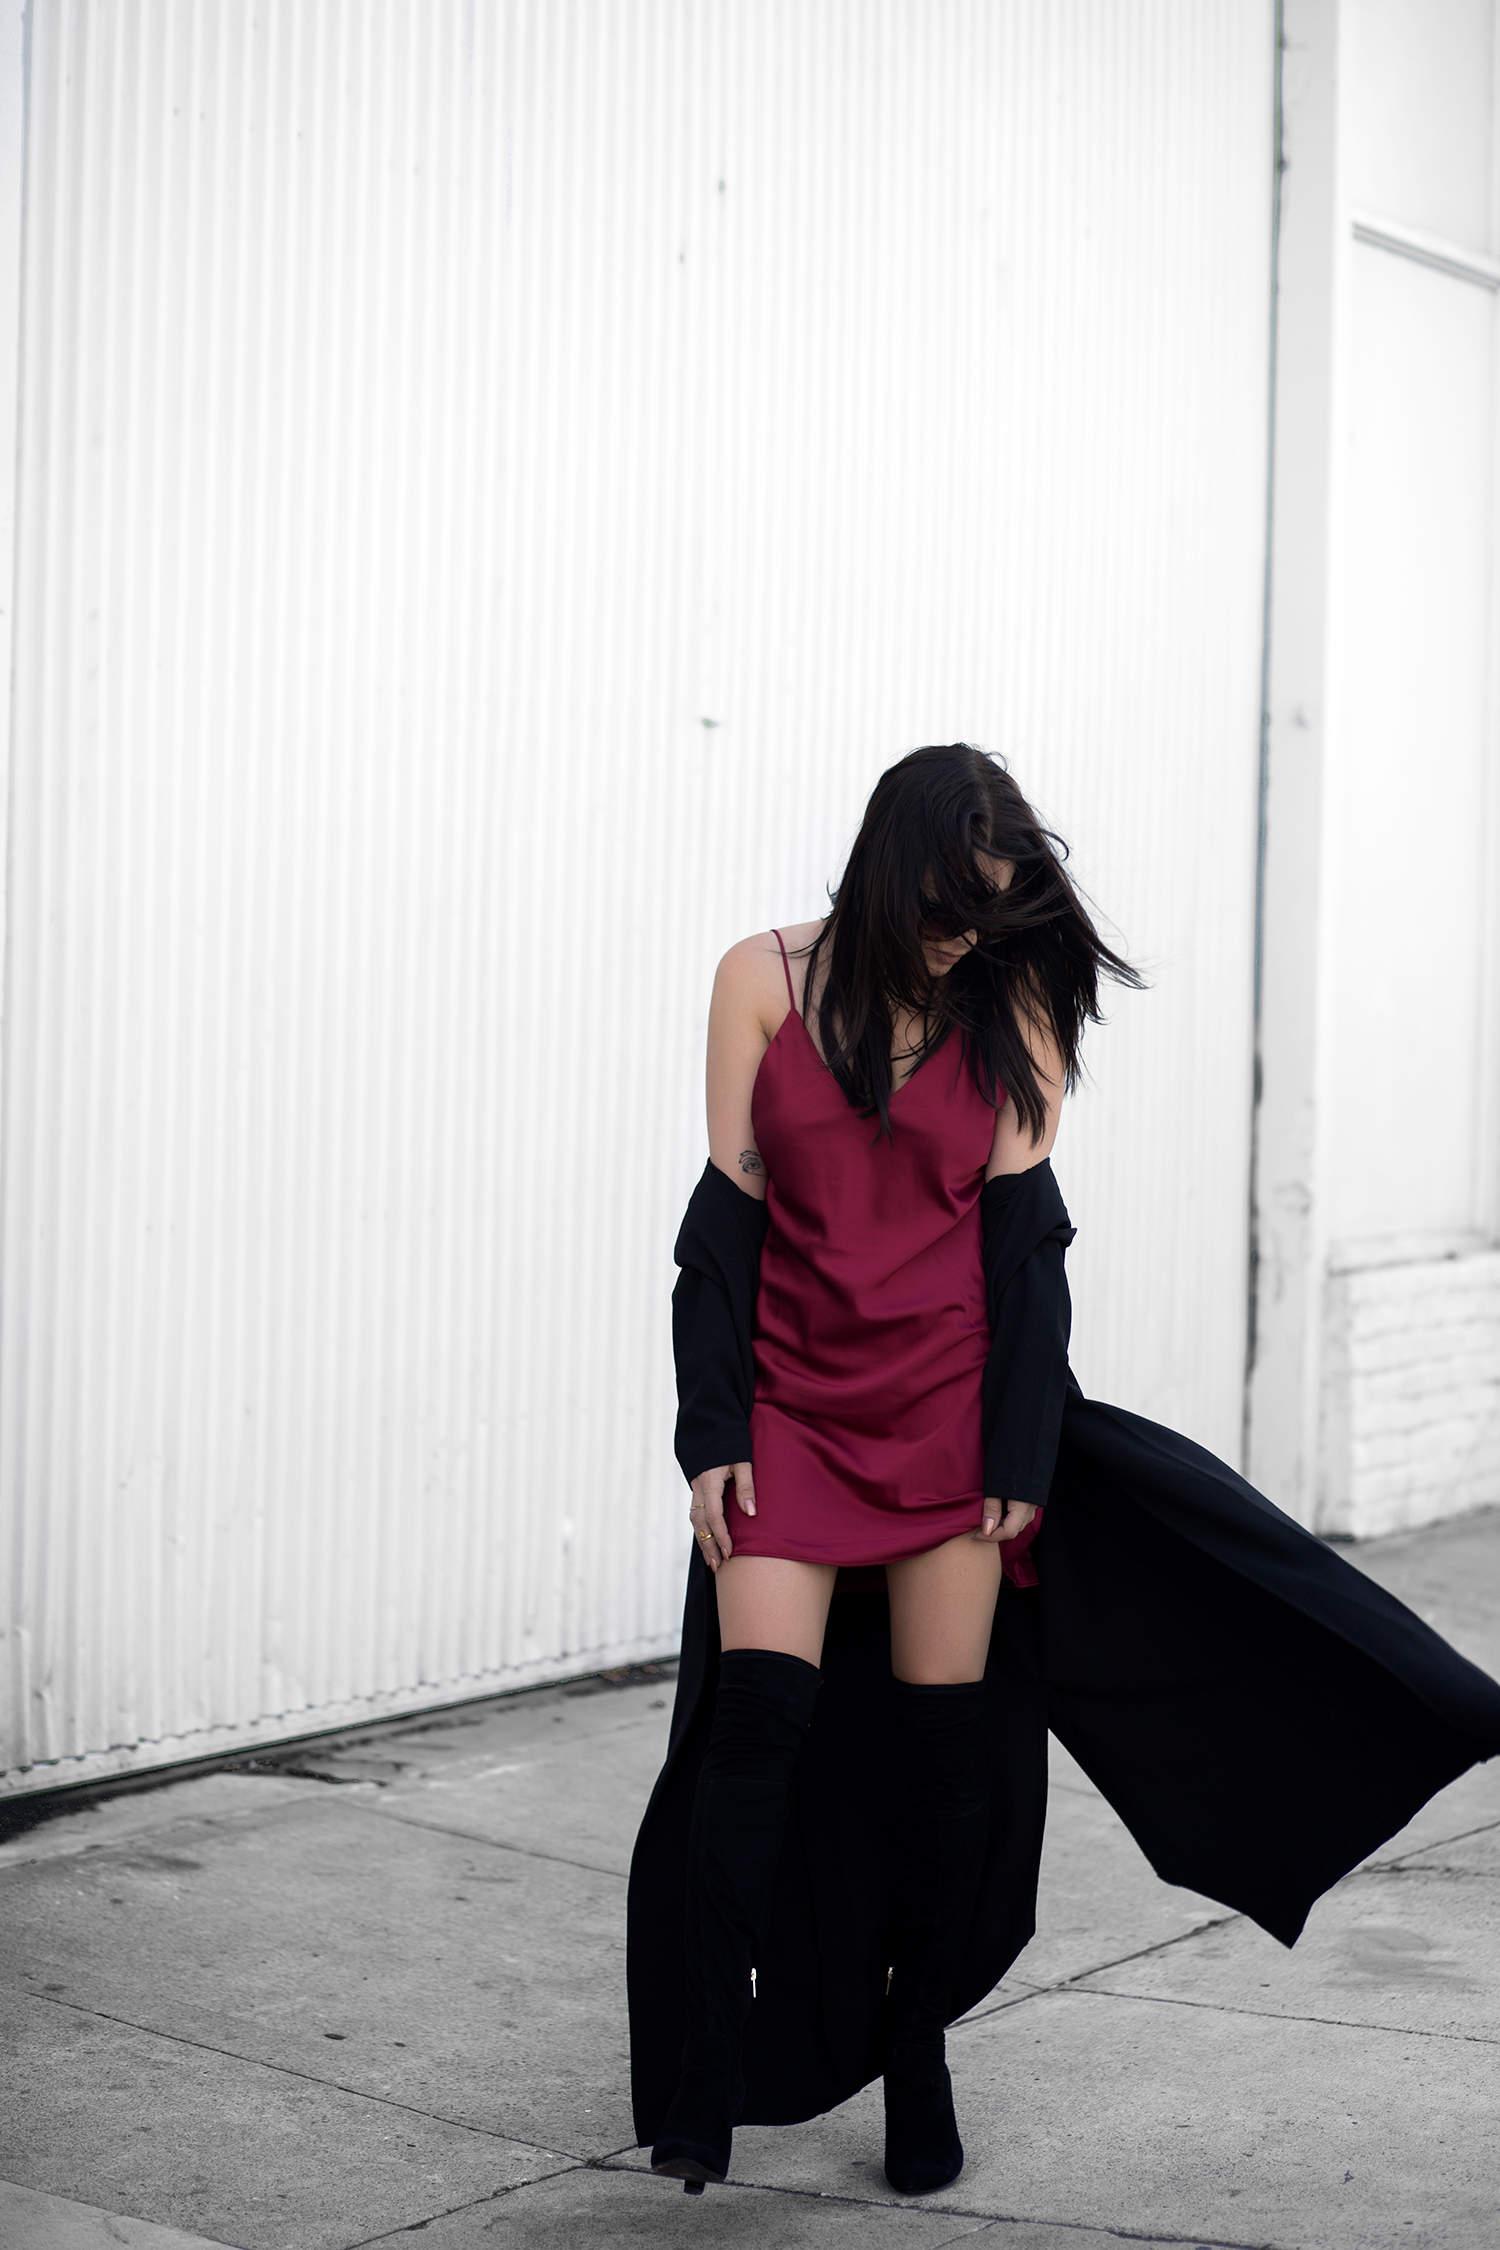 short skirt, long jacket, fashionlush